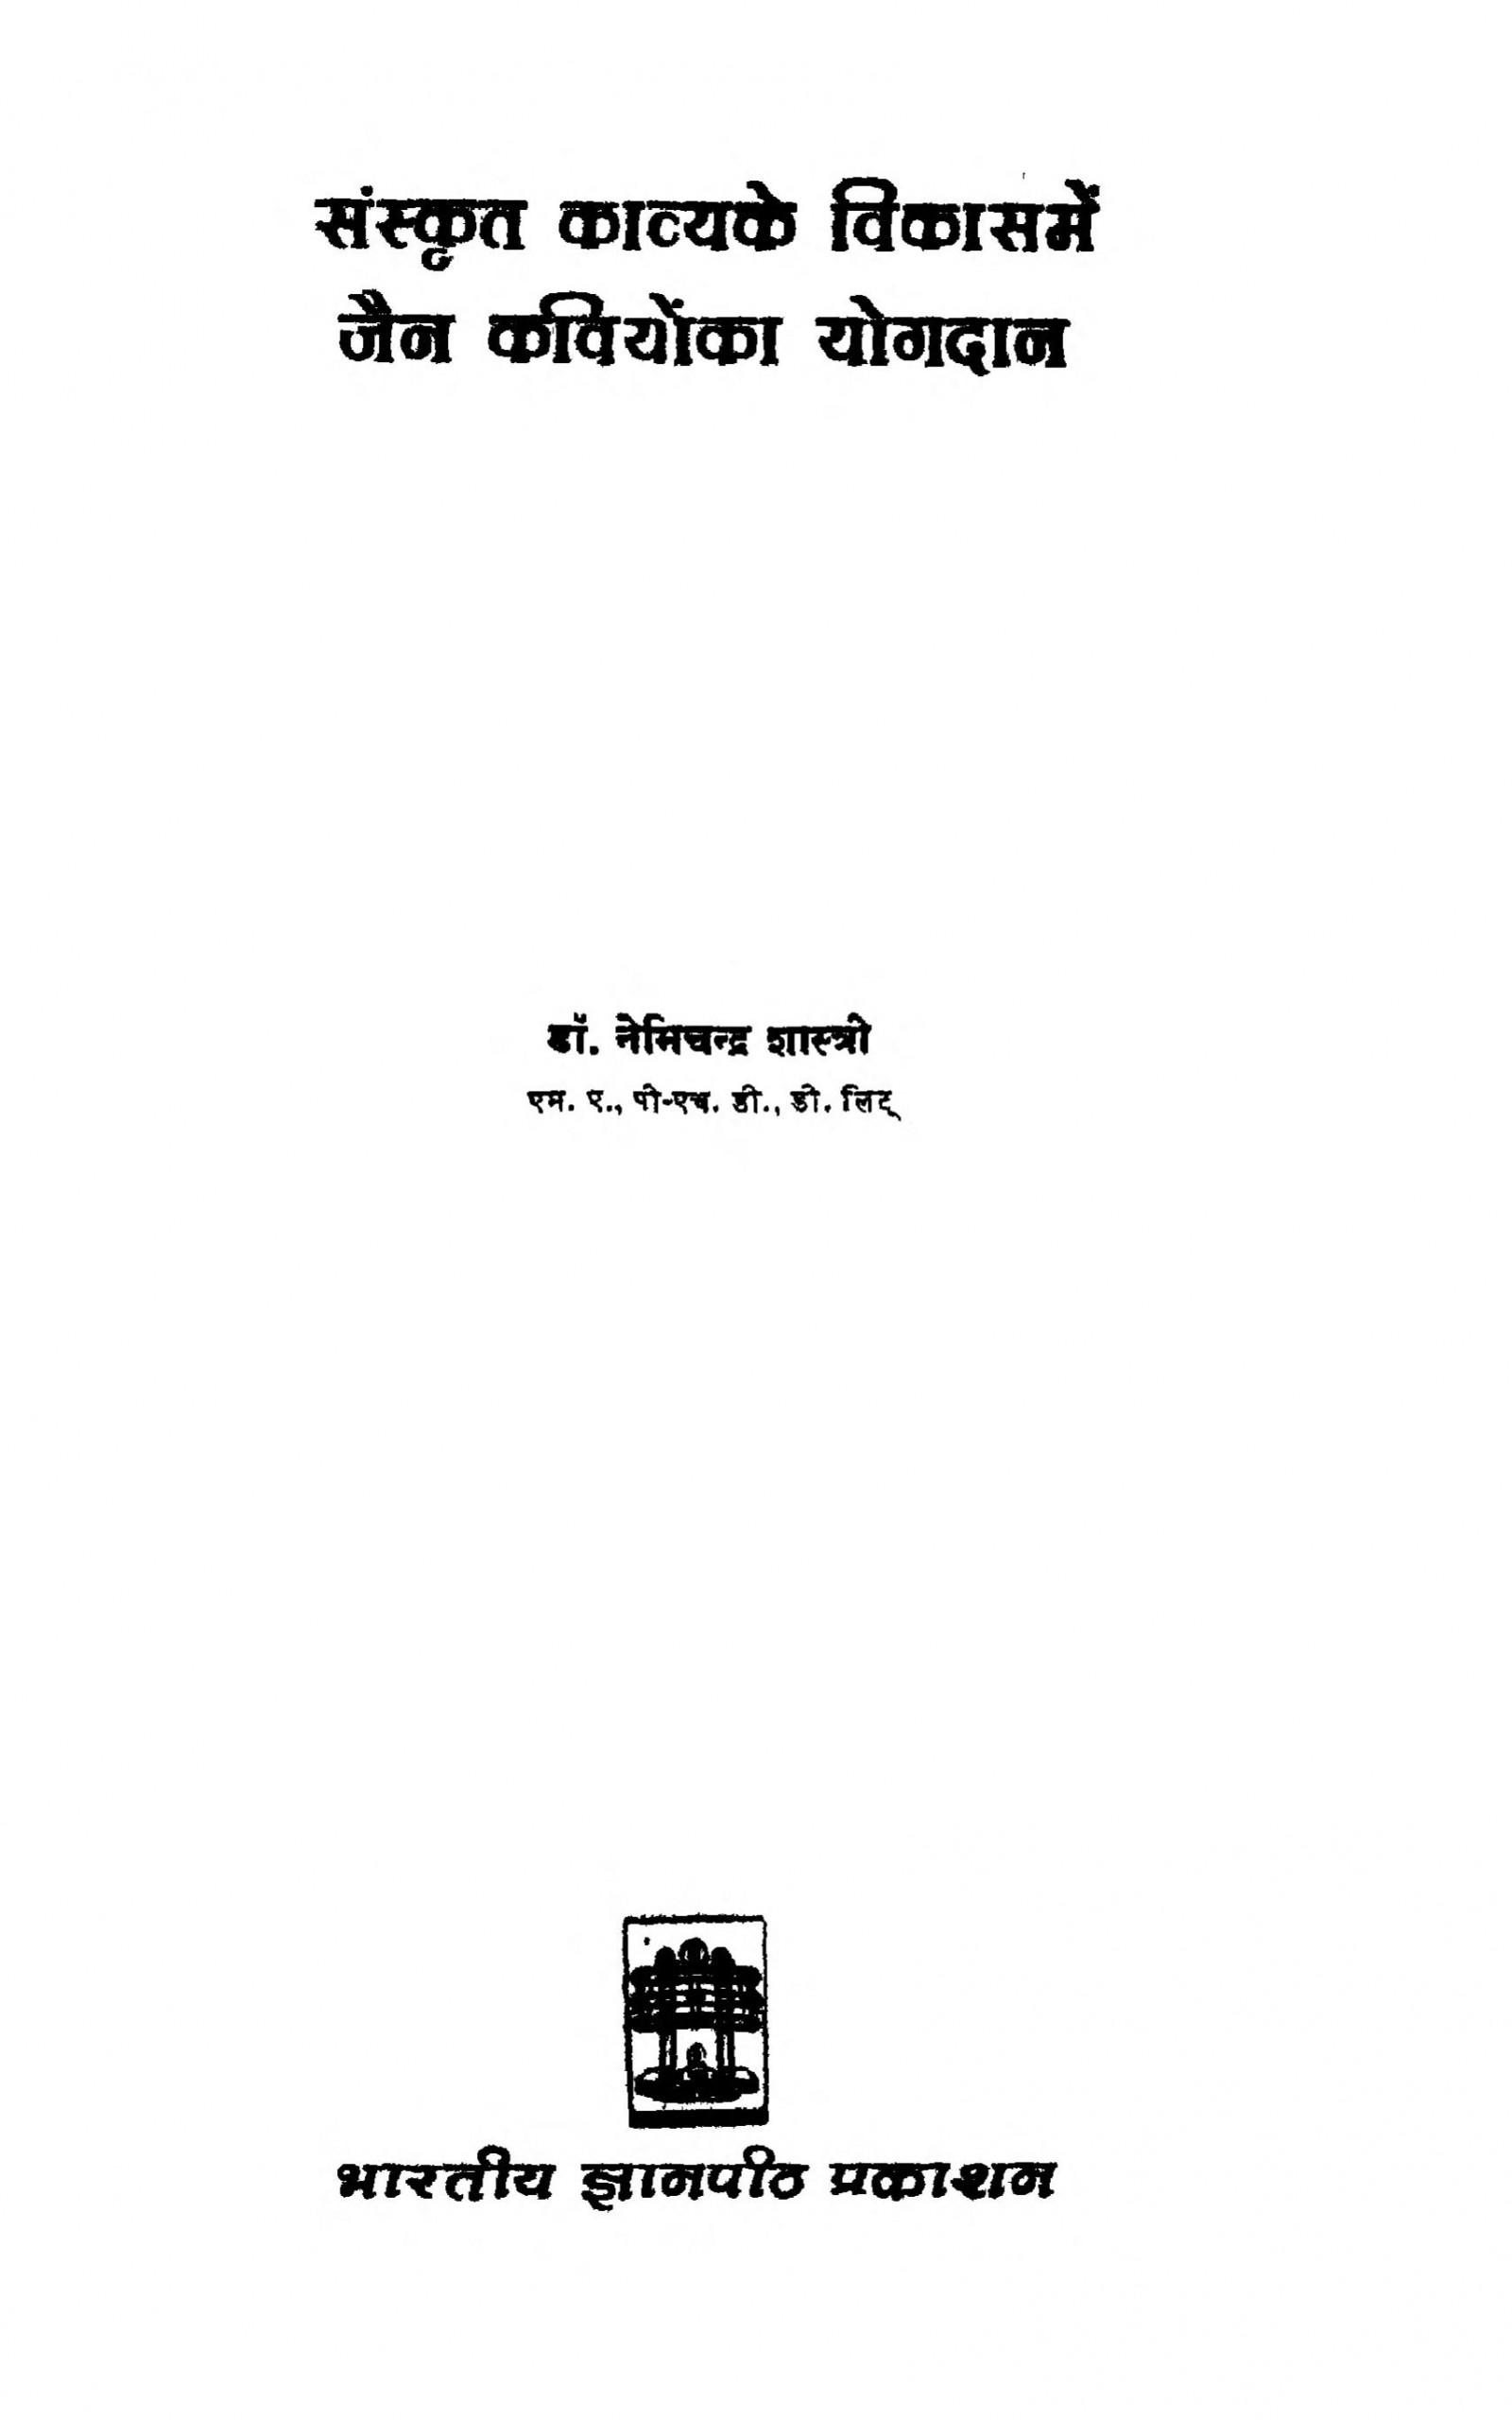 Book Image : संस्कृत काव्य के विकास में जैन कवियों का योगदान - Sanskrit Kavya Ke Vikas Men Jain Kaviyon Ka Yogadan